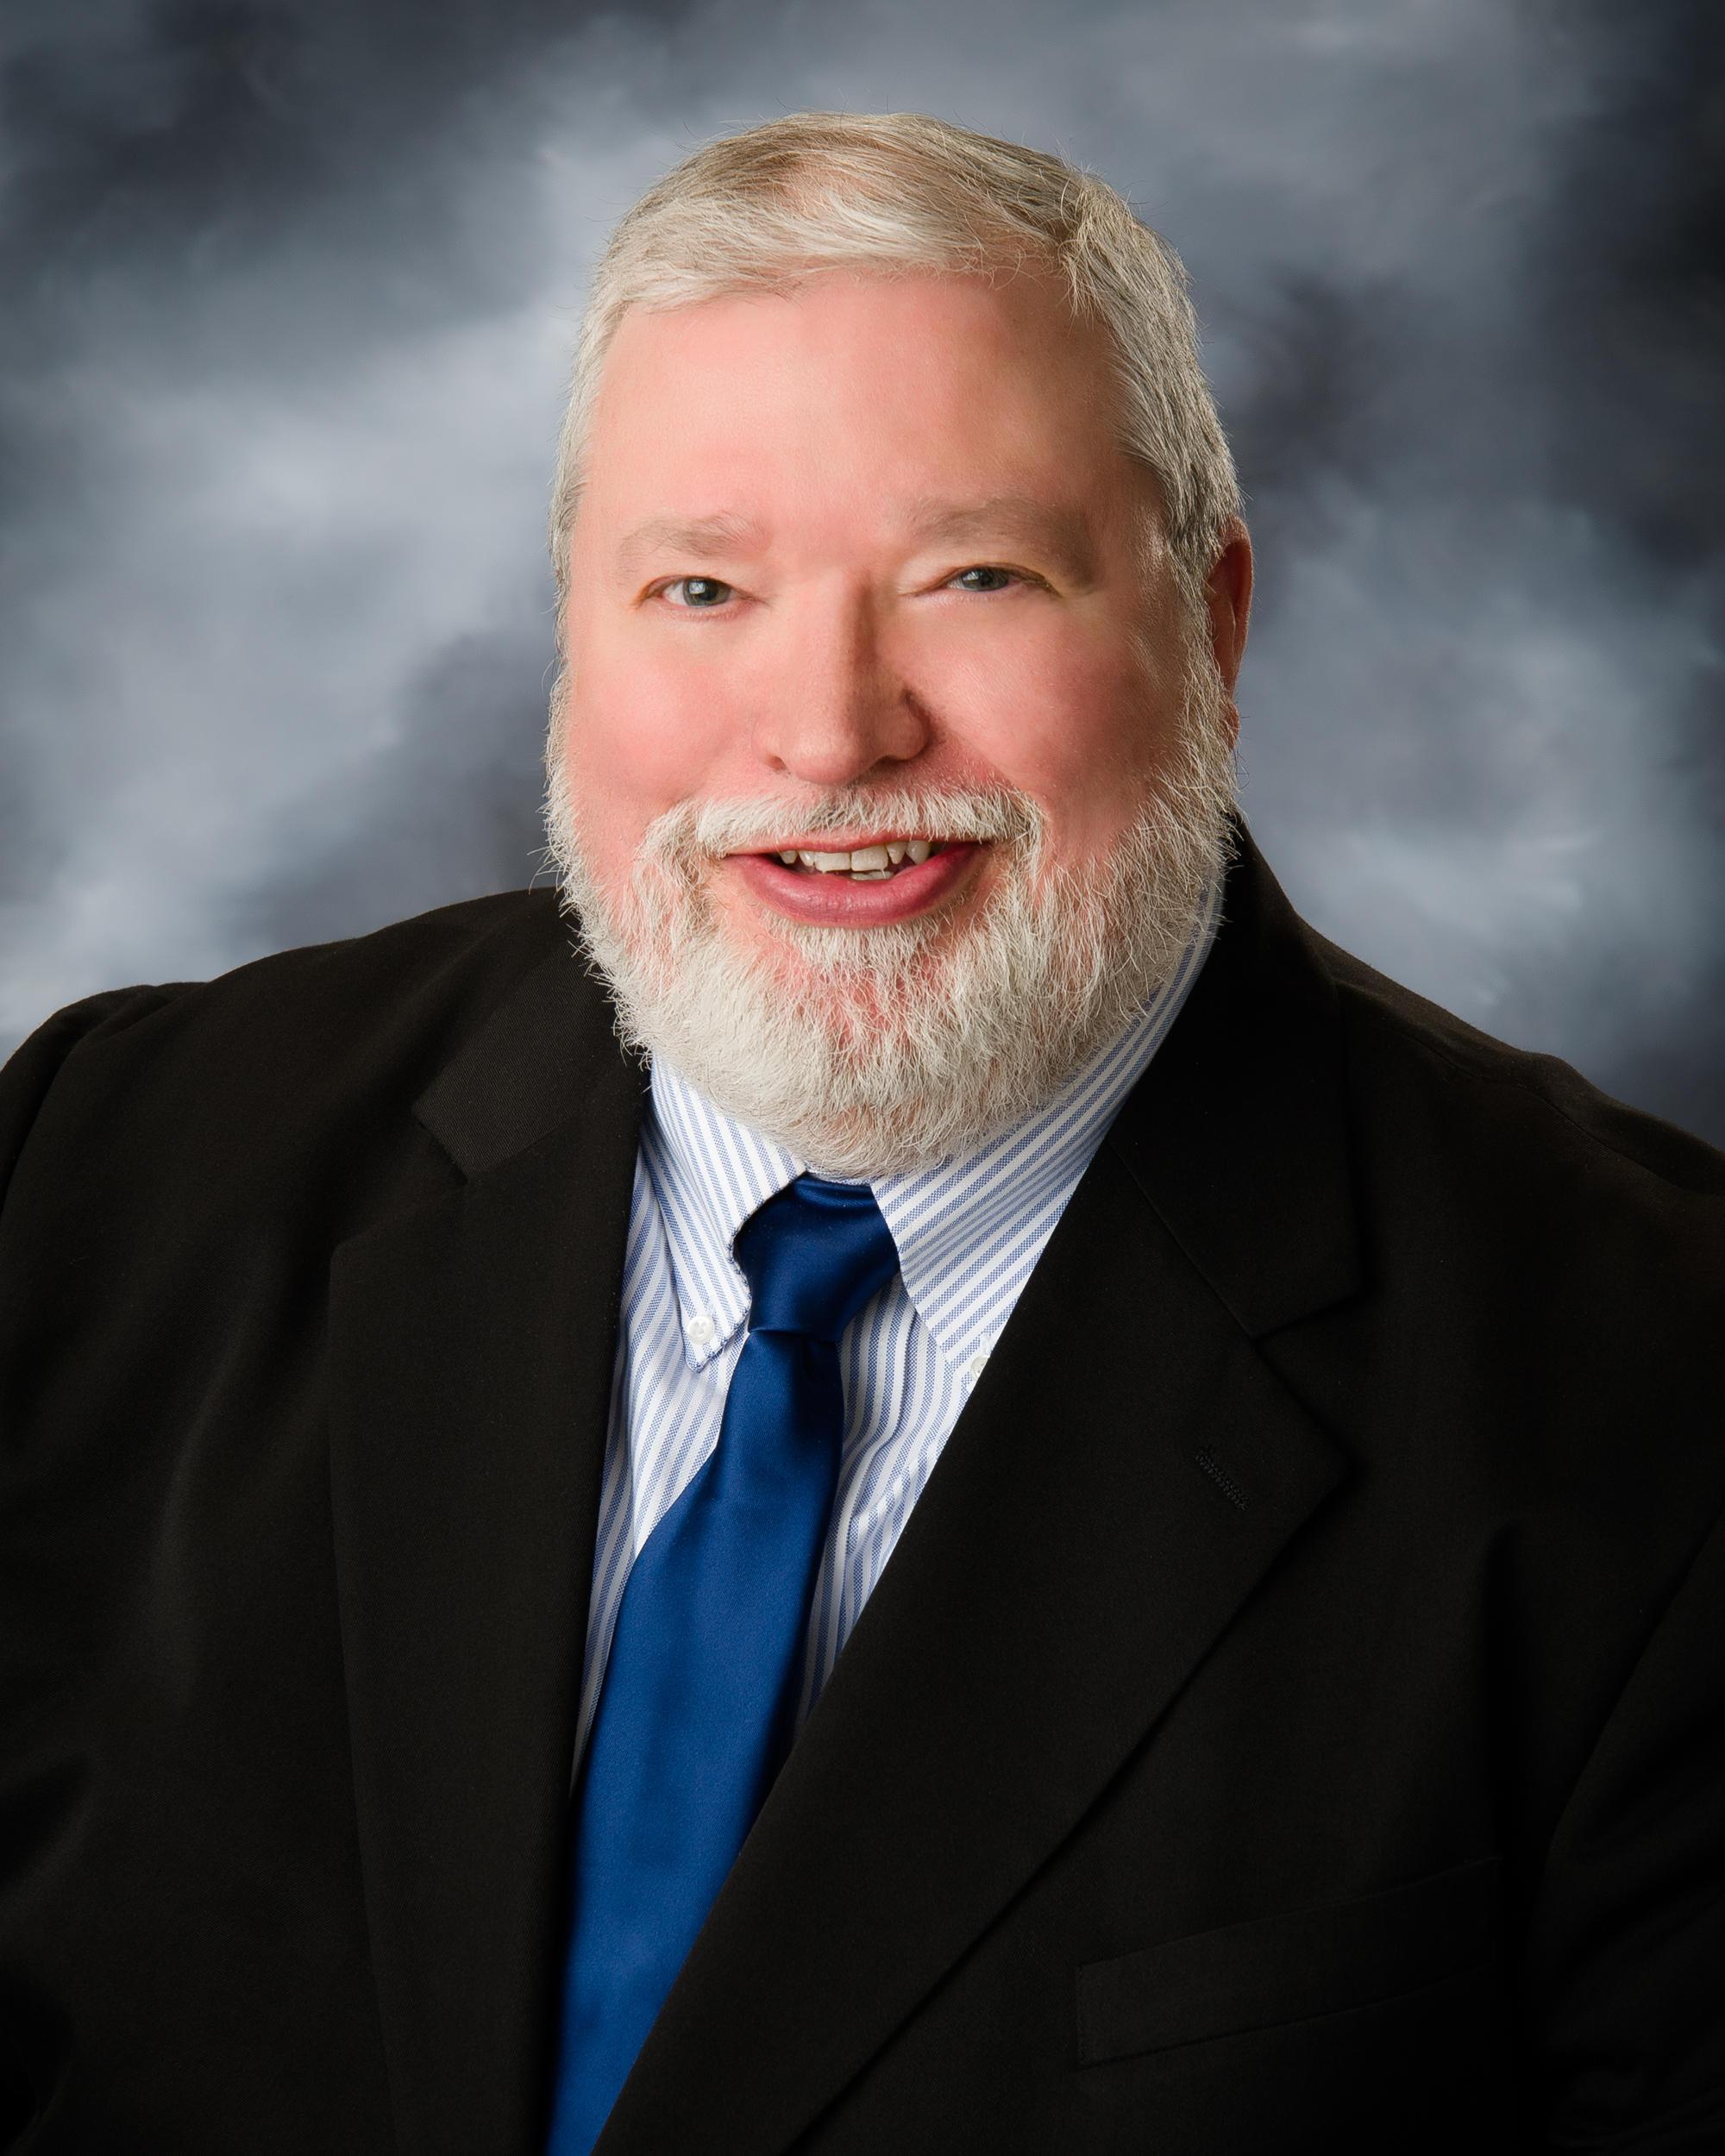 Michael M Wall MD